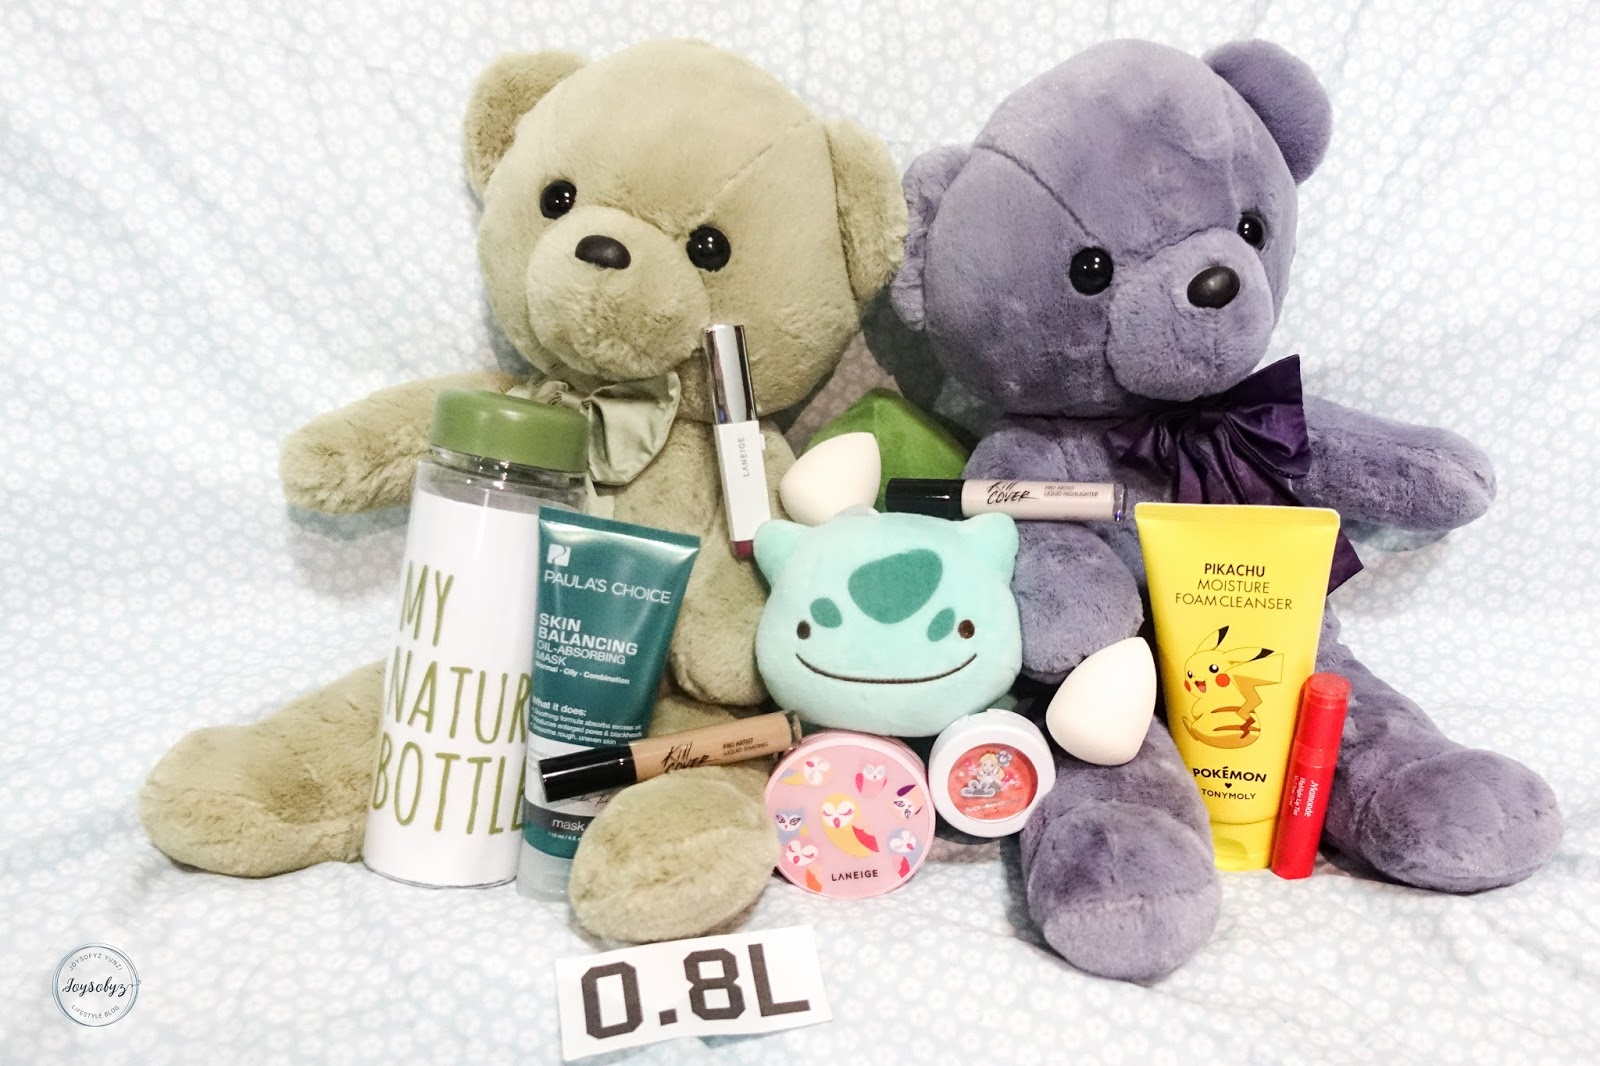 @joysofyz's cover photo for 'Joysofyz: [Beauty]: Everyone Can Get 100% FREE Korea Cosmetics at 0.8L!'